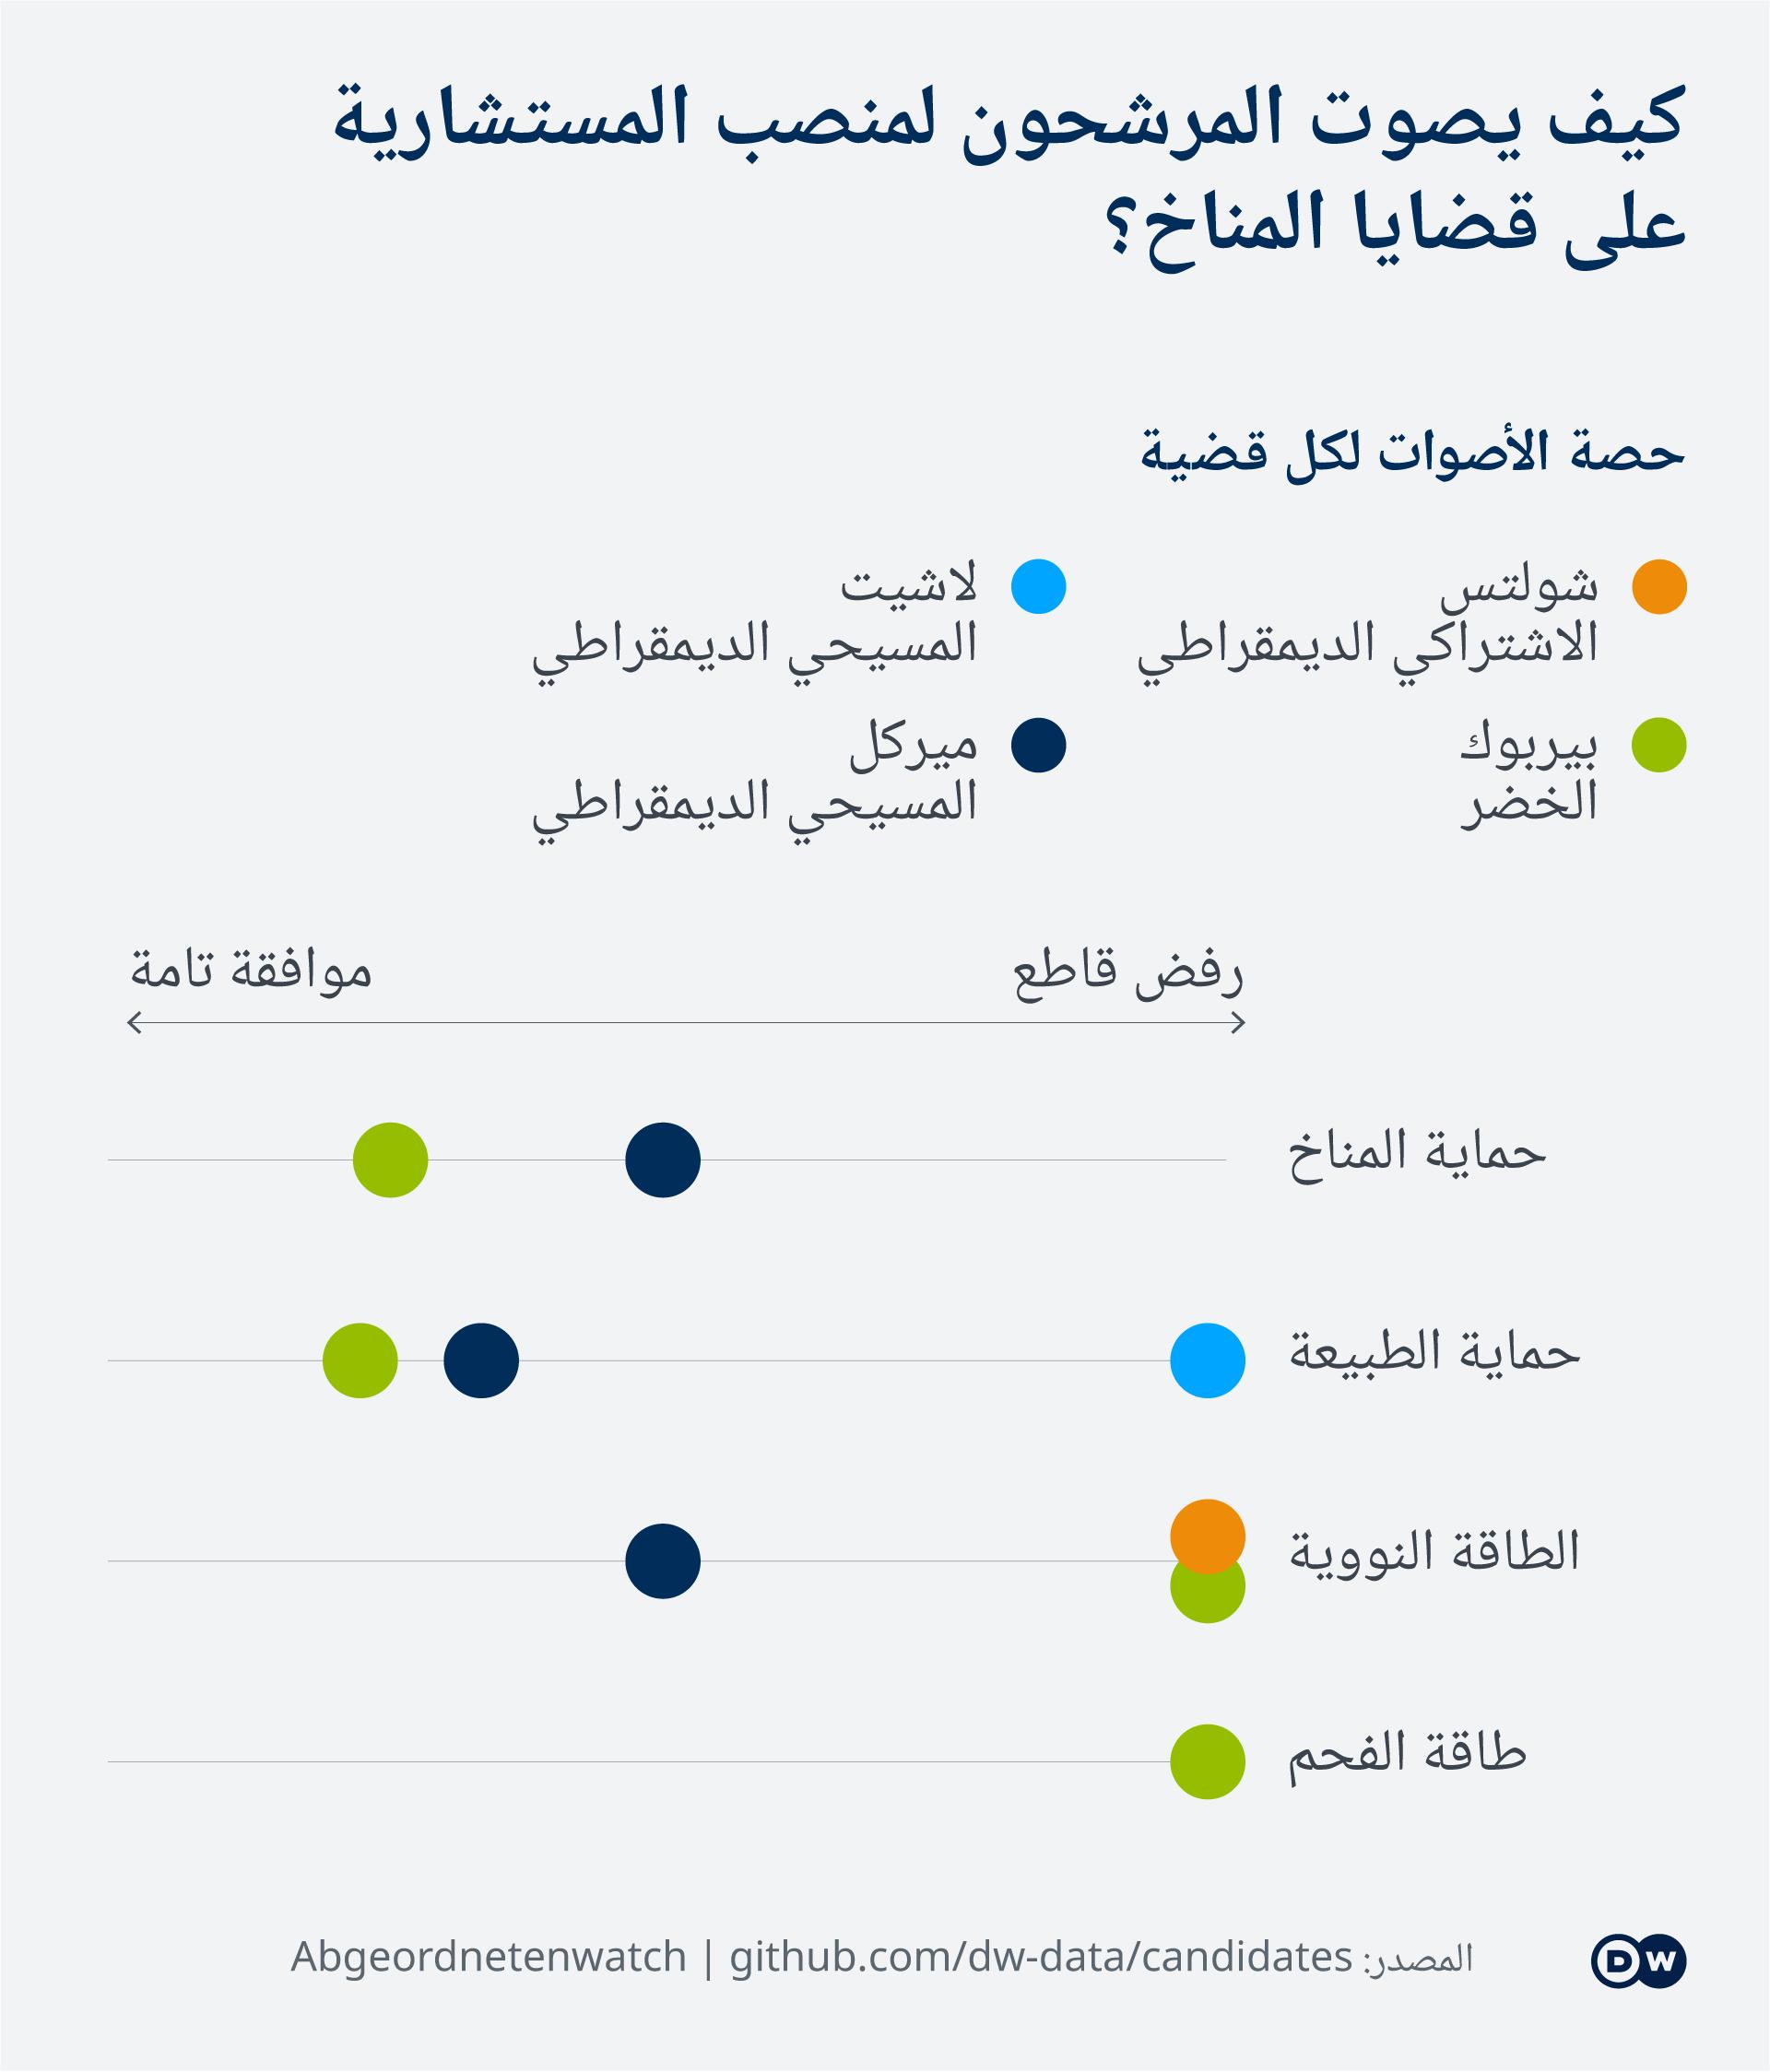 Data visualization Germany chancellor candidate comparison environment